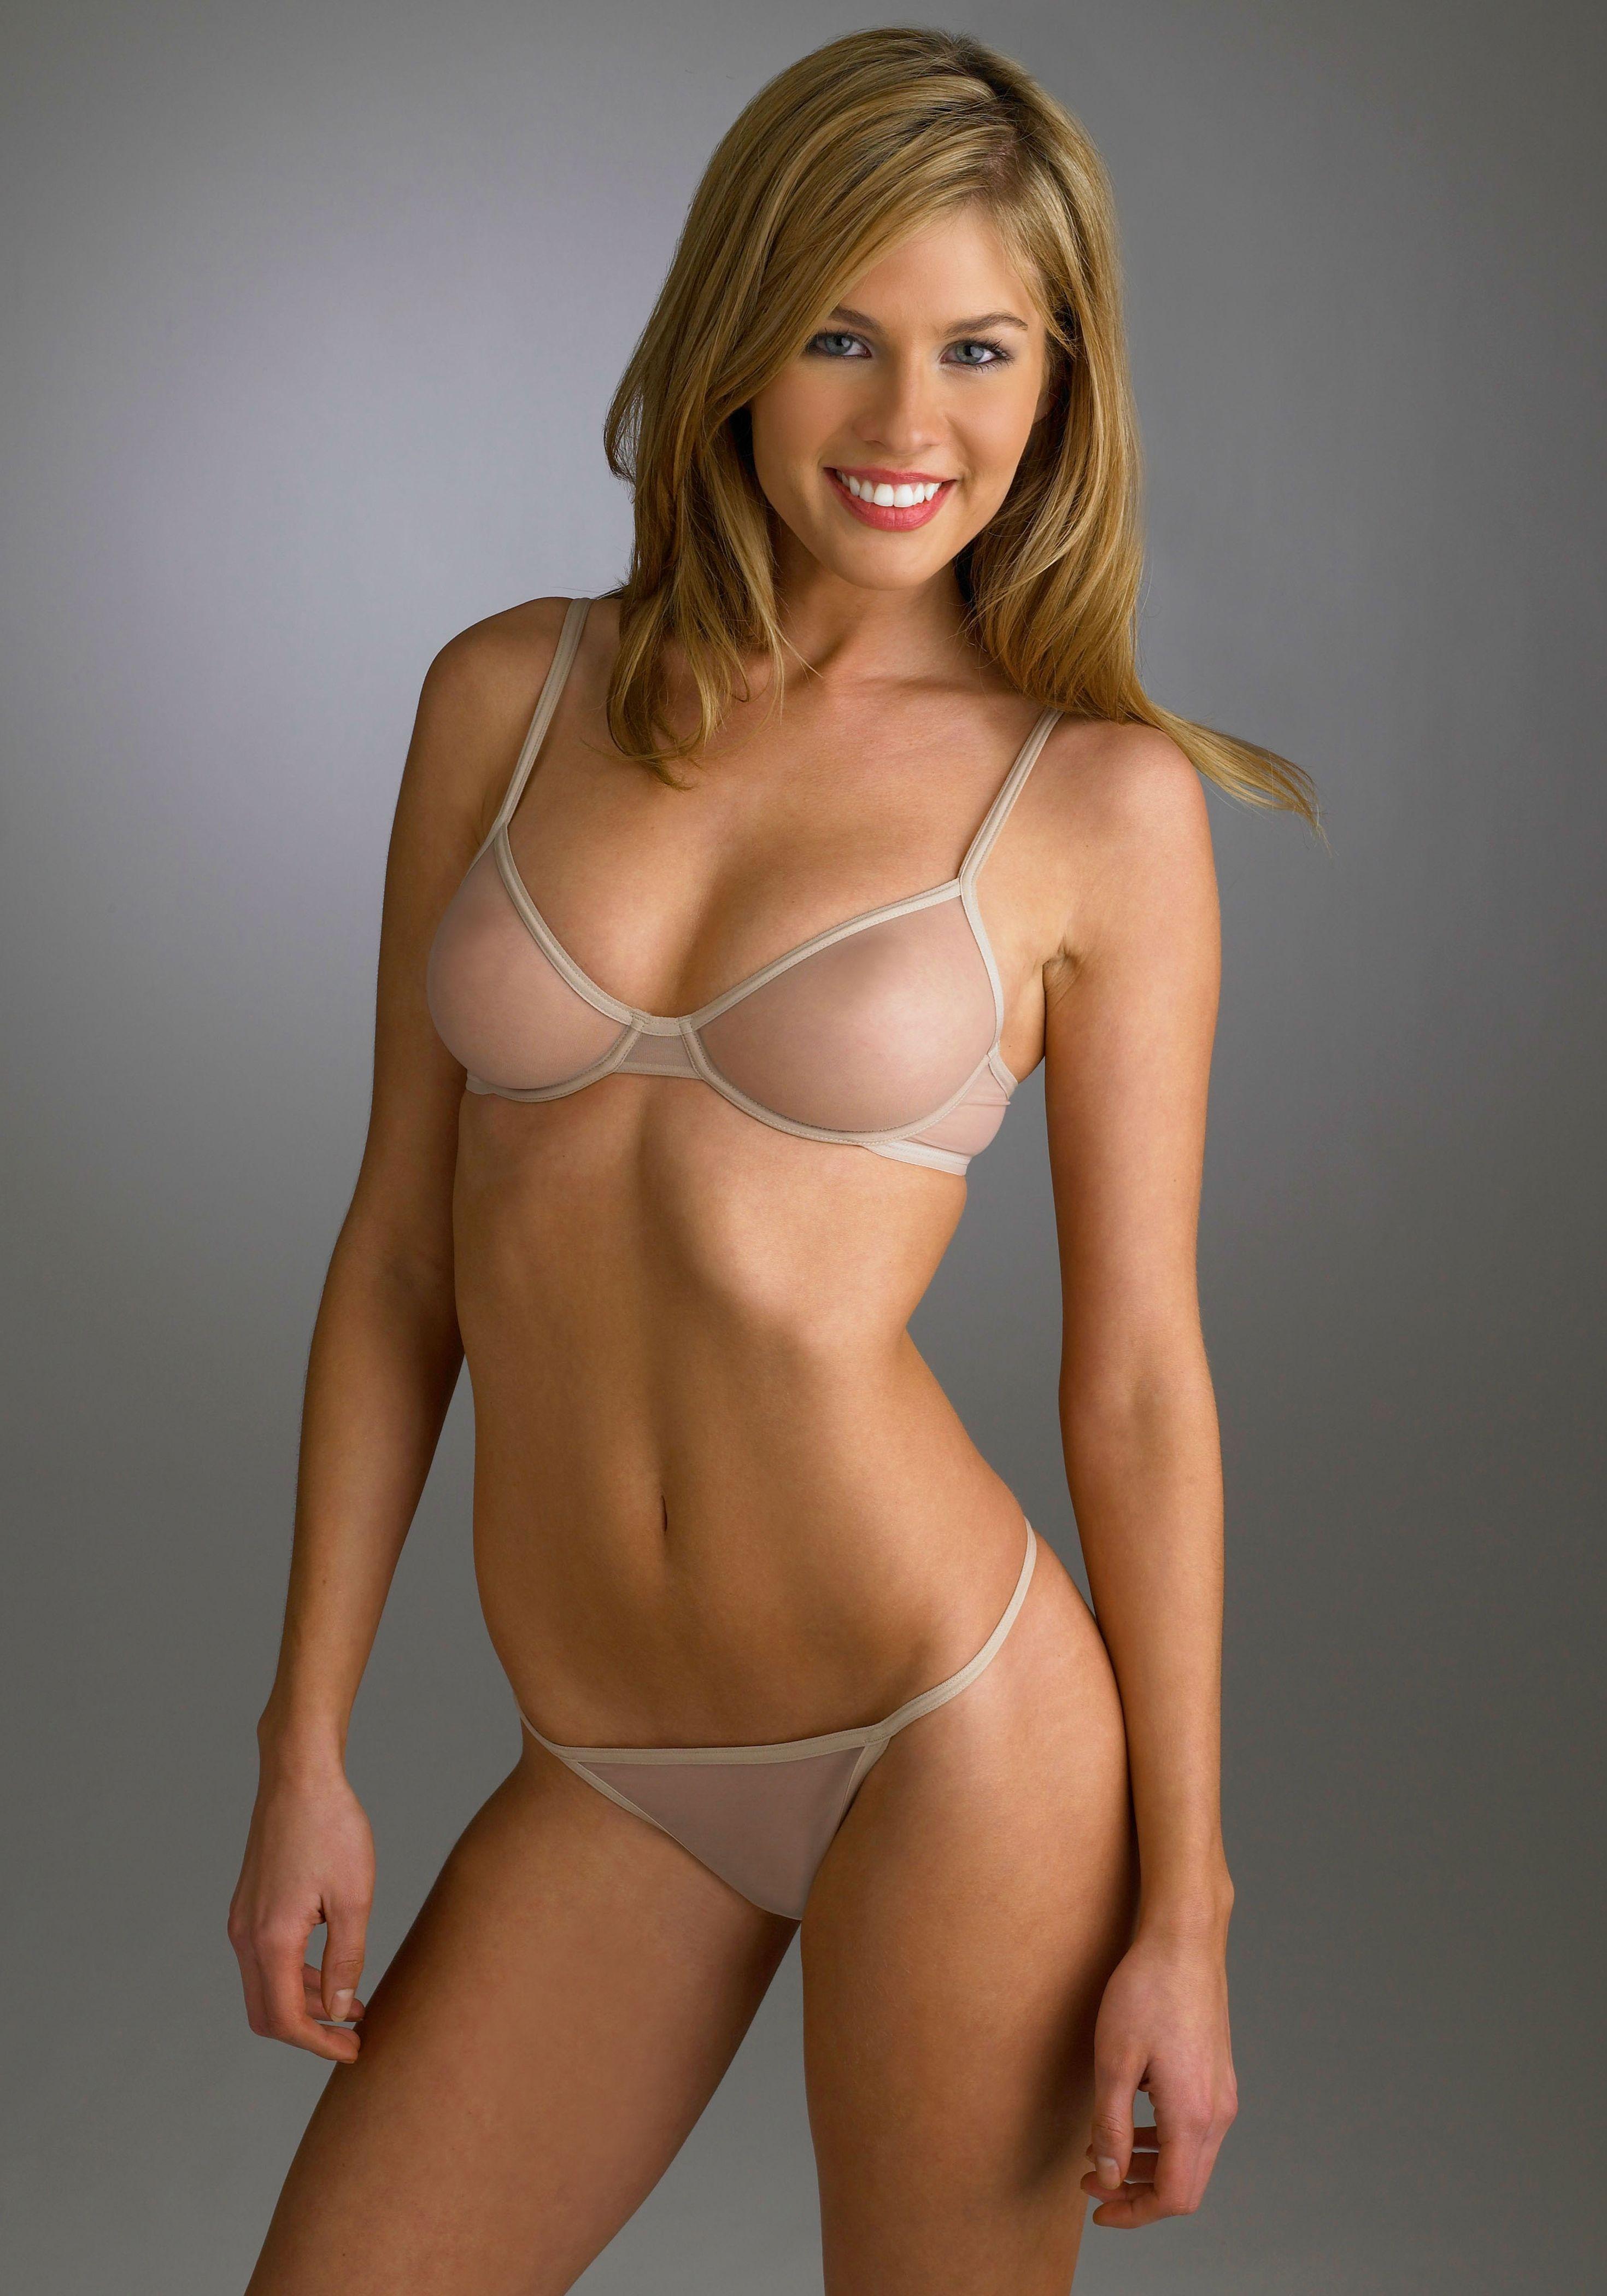 Caitlin_Manley_7.jpg   Models Rating